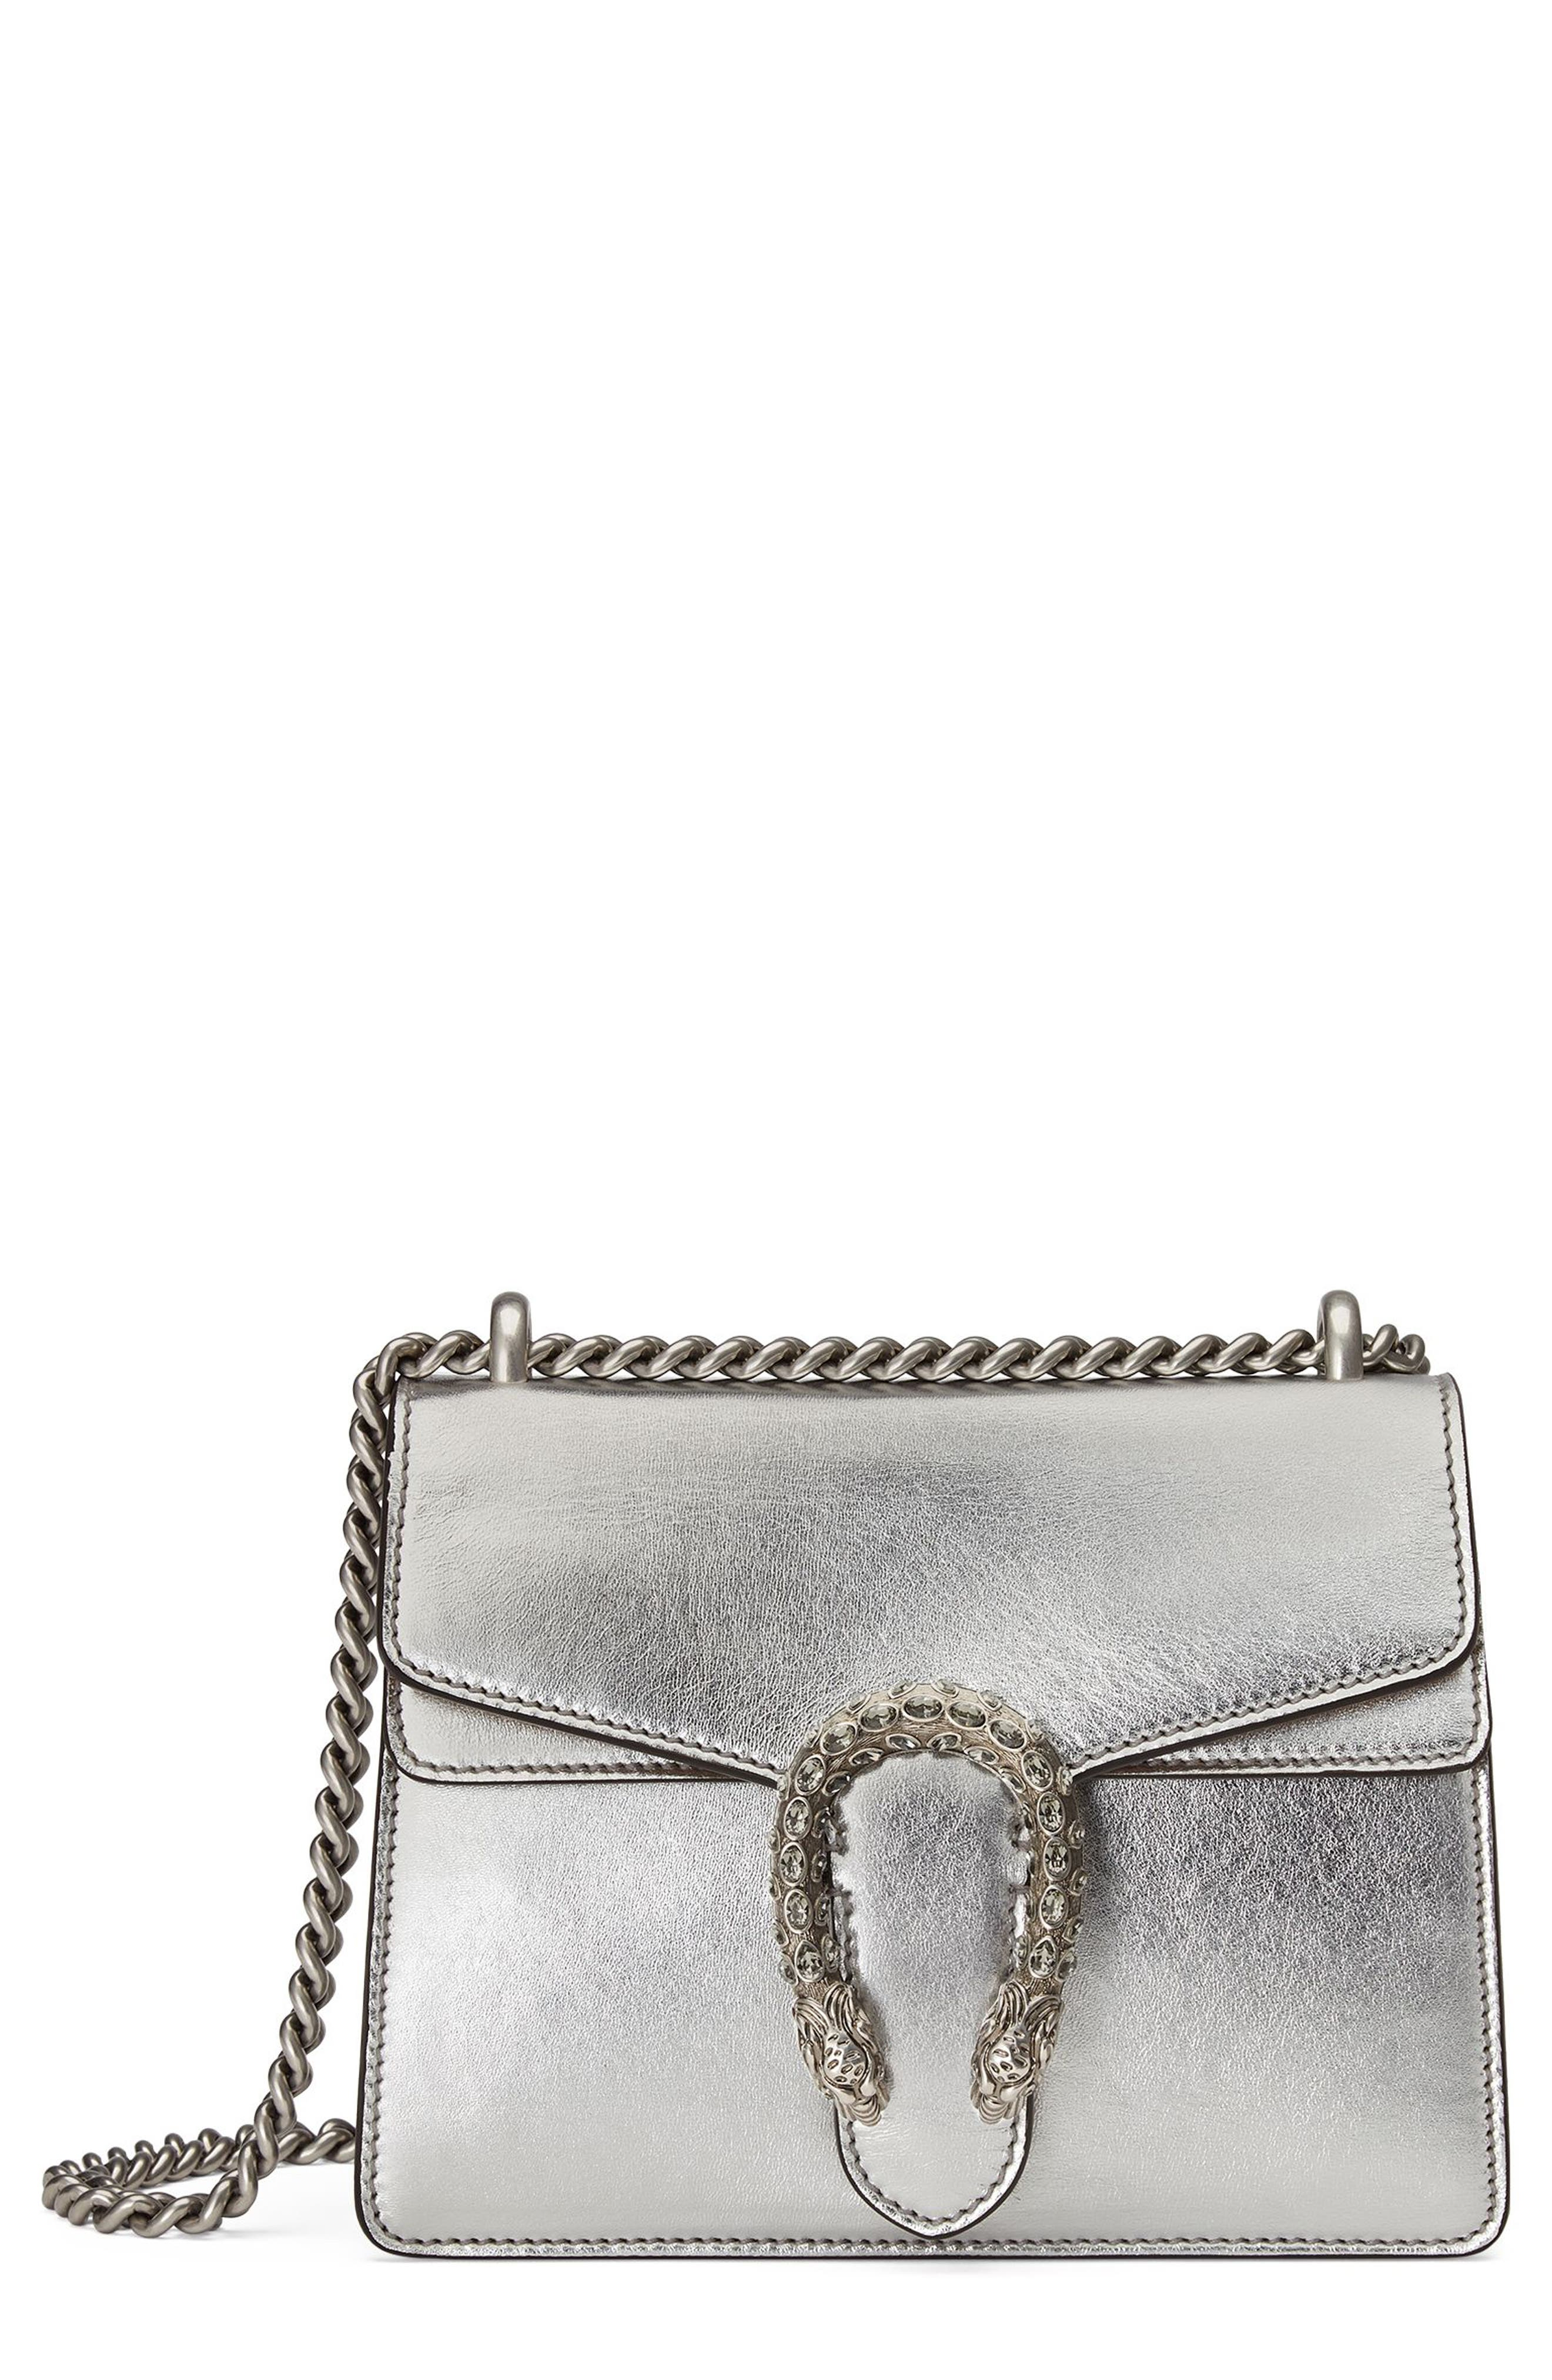 Mini Dionysus Metallic Leather Shoulder Bag,                             Main thumbnail 1, color,                             Argento/Blk Diamond